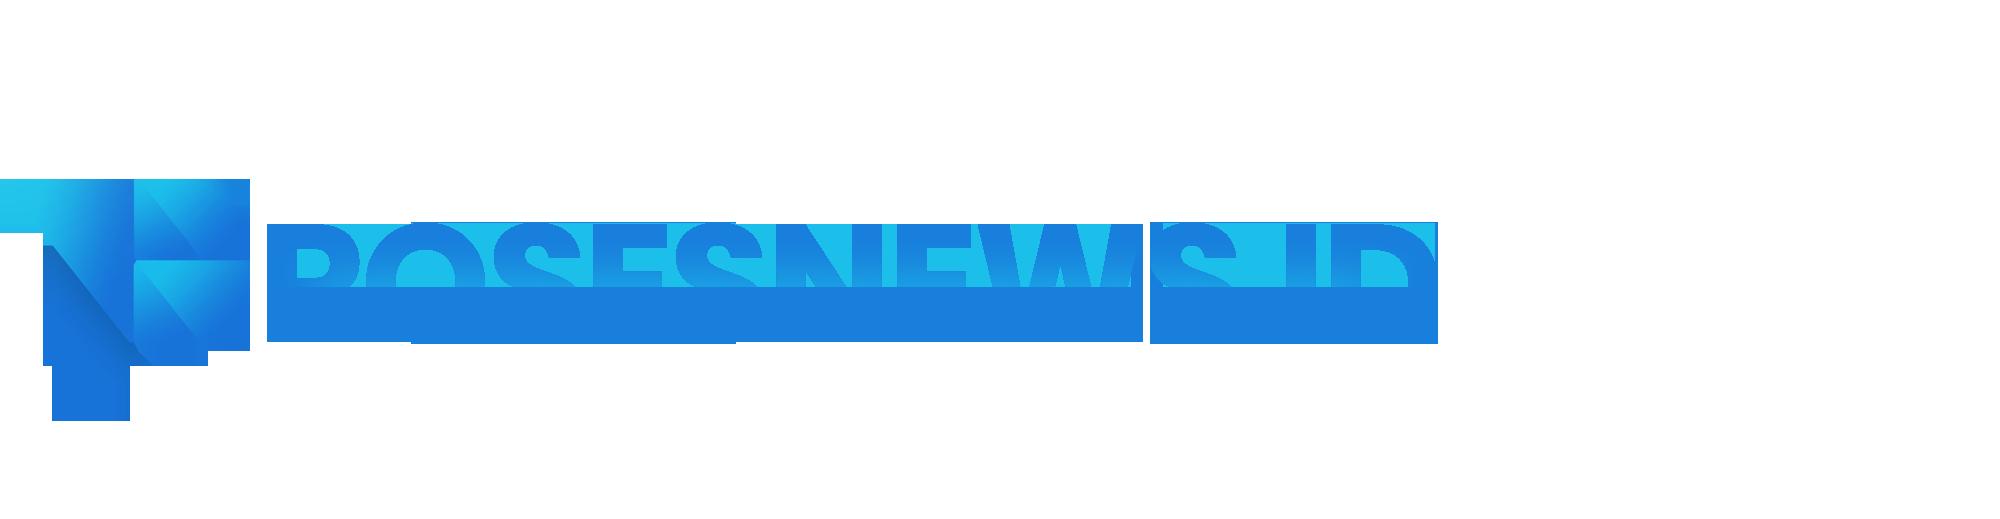 Prosesnews.id